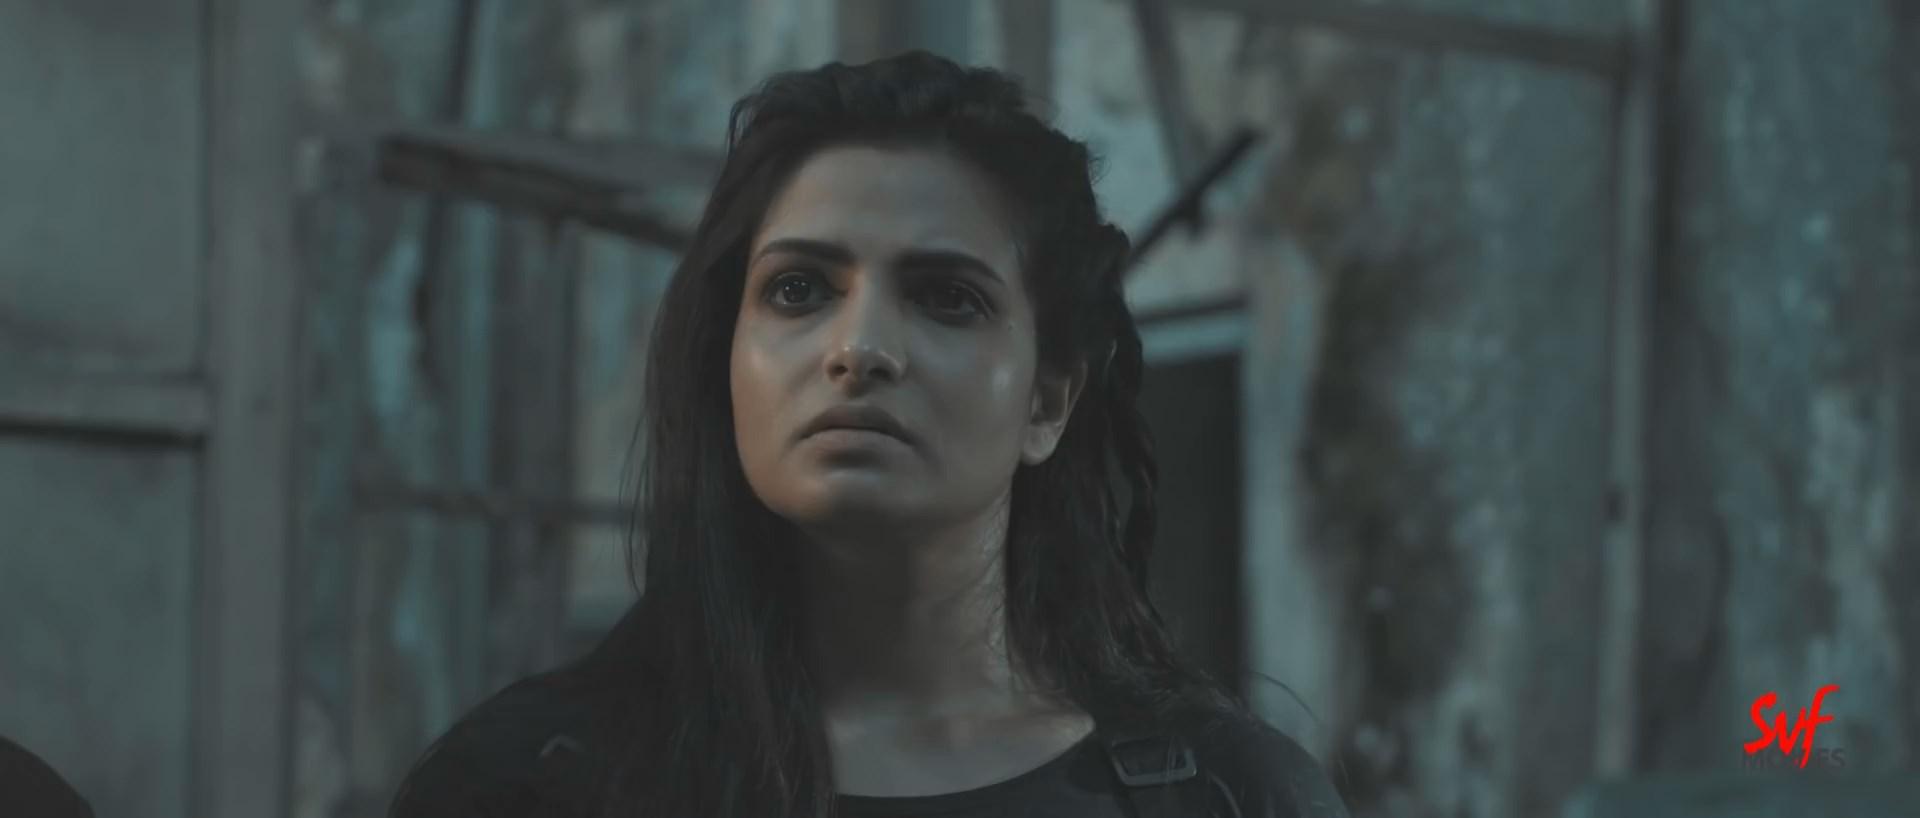 Zombiesthaan 2021 Full Bengali Film.mp4 snapshot 01.19.14.875